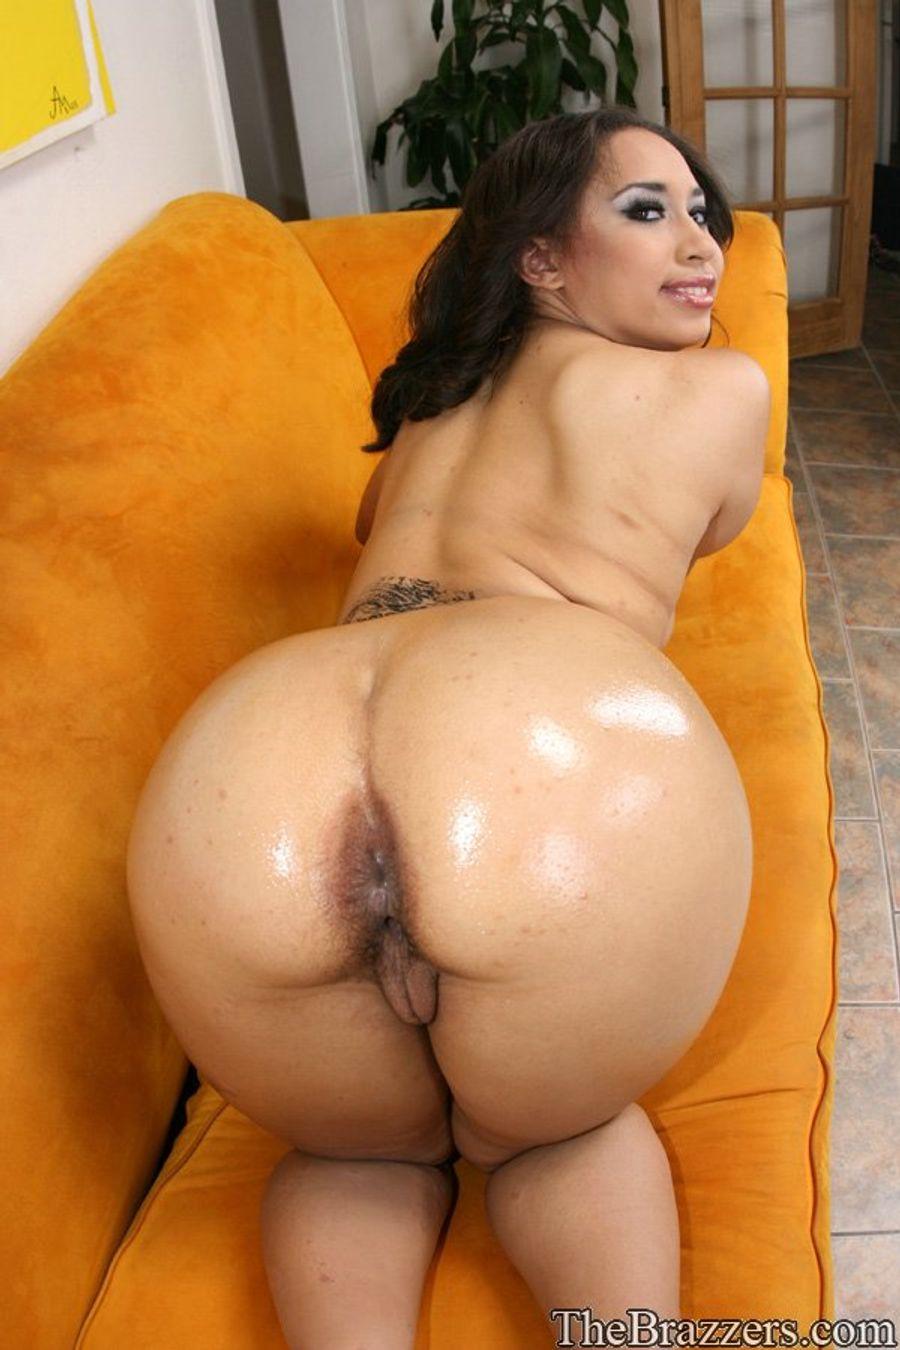 порно звезды латинки фото с голыми жопами